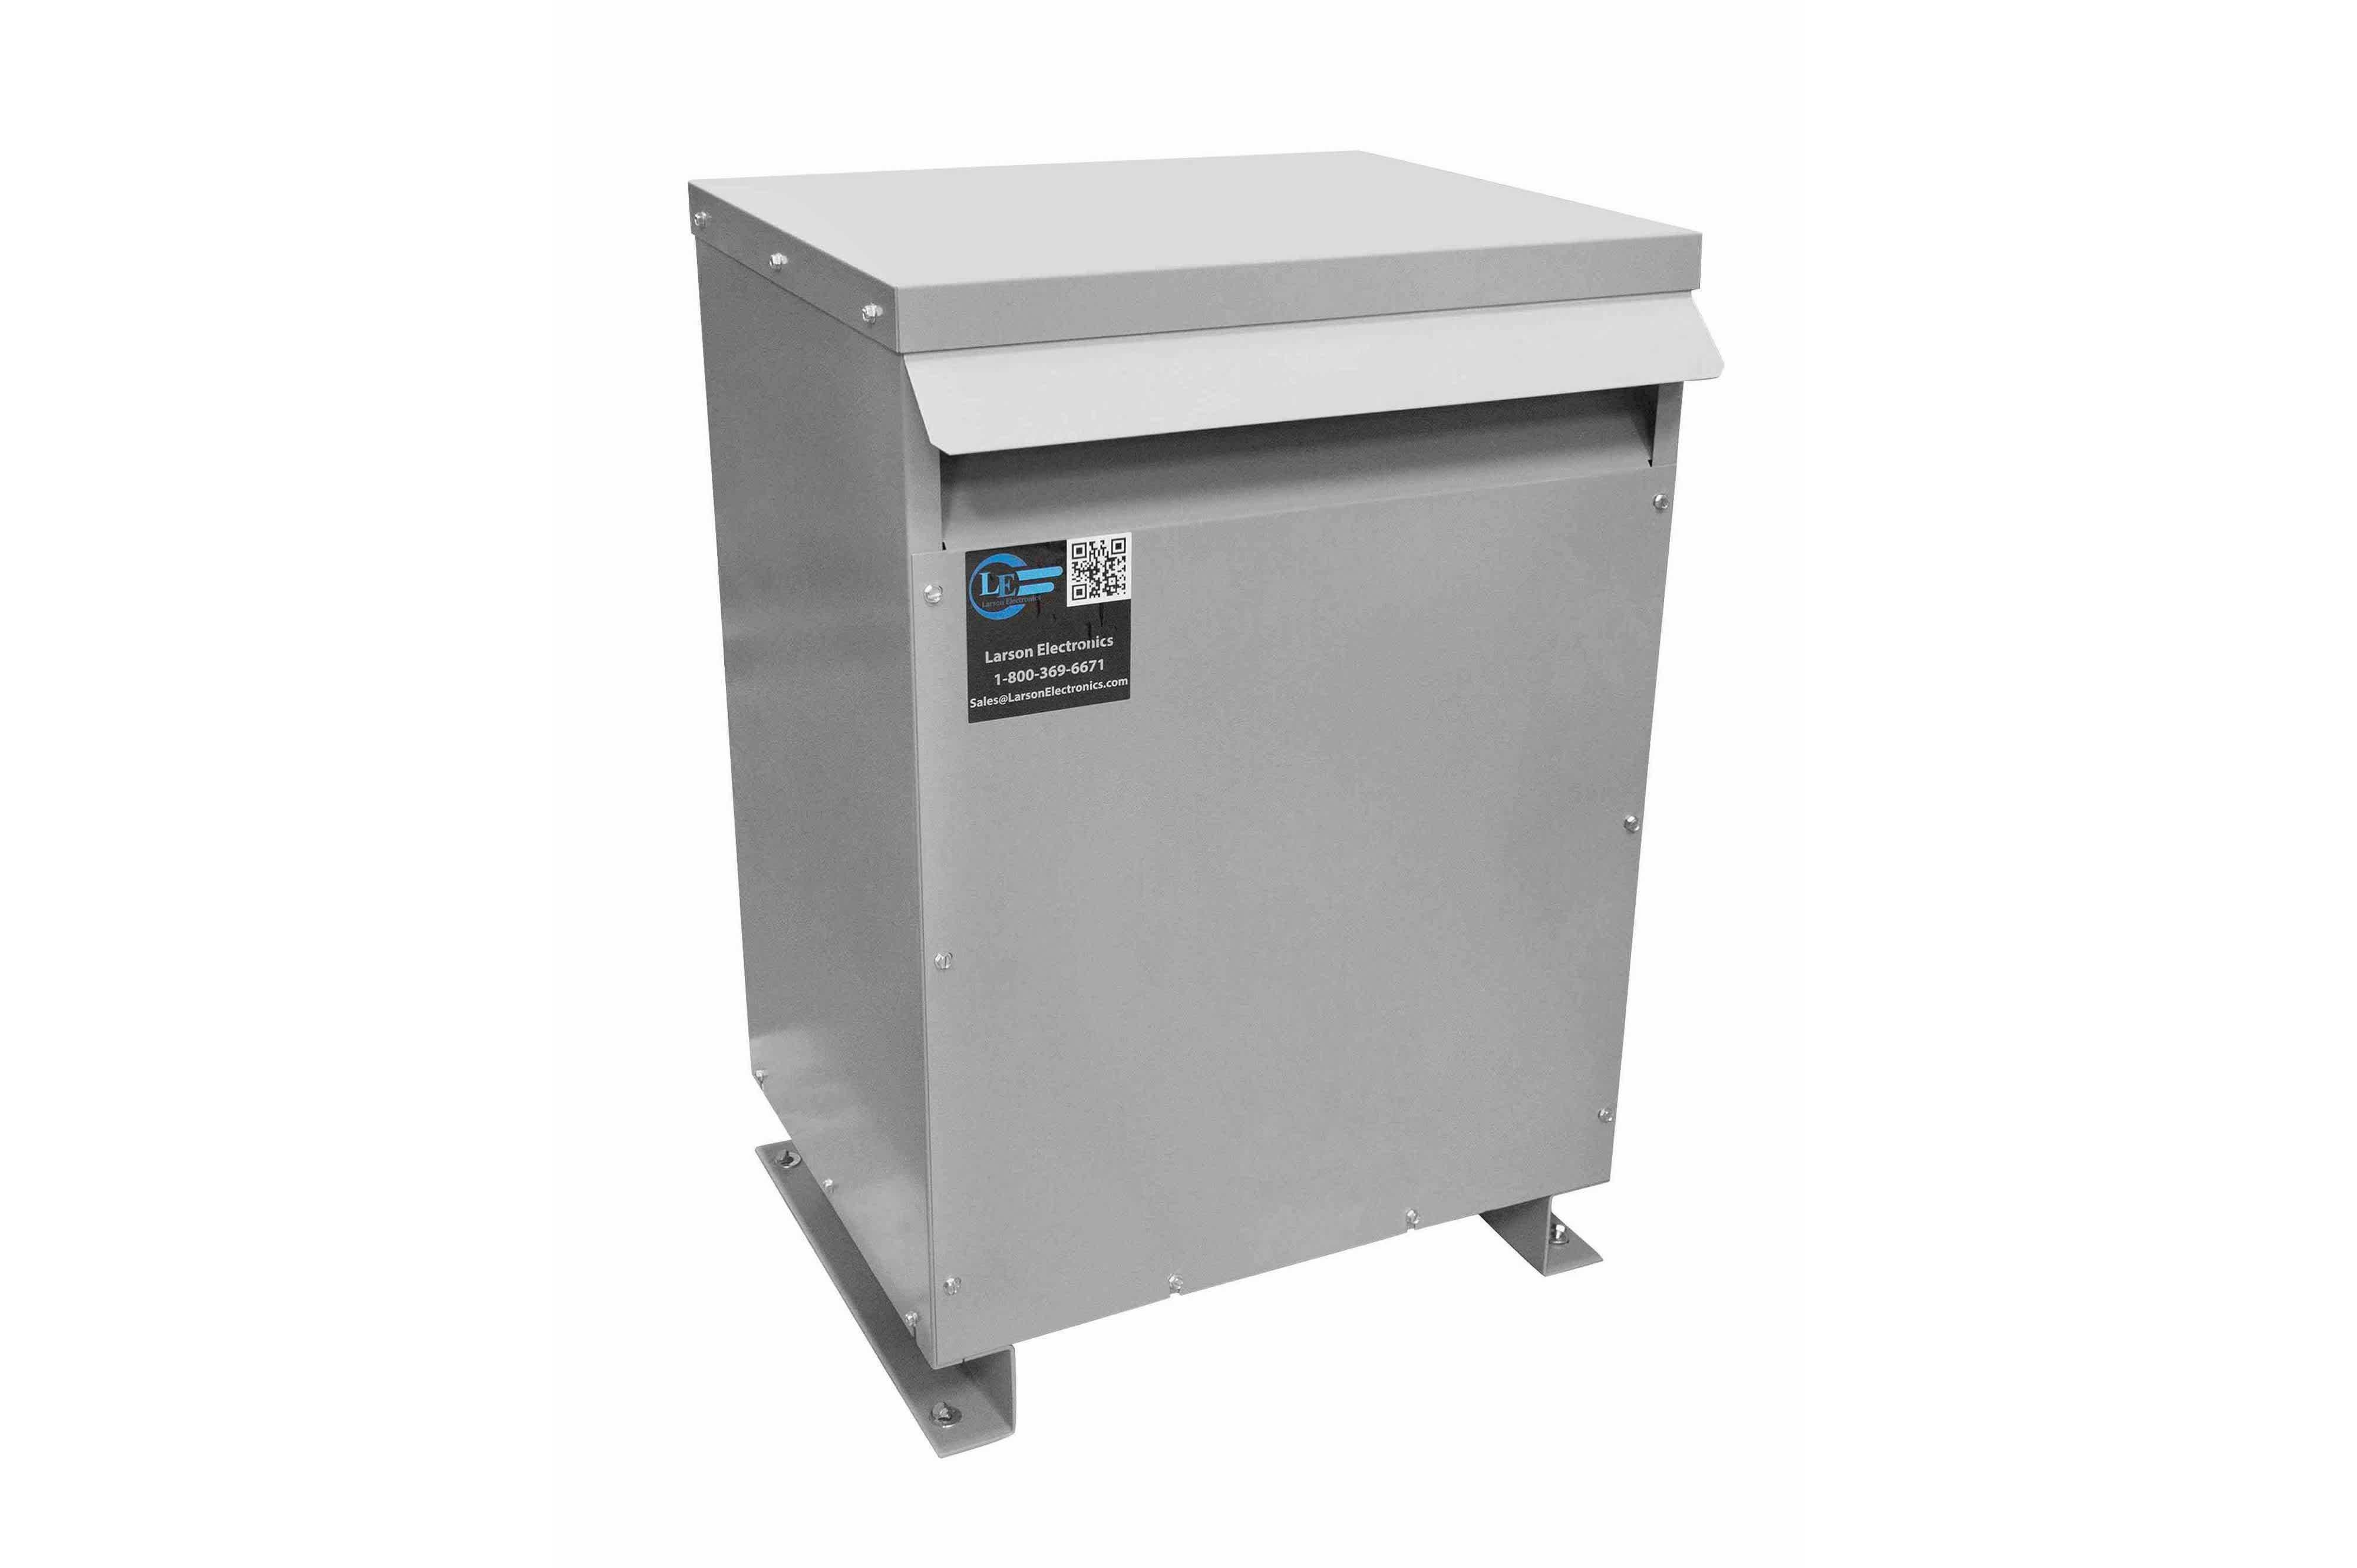 22.5 kVA 3PH Isolation Transformer, 230V Wye Primary, 480V Delta Secondary, N3R, Ventilated, 60 Hz